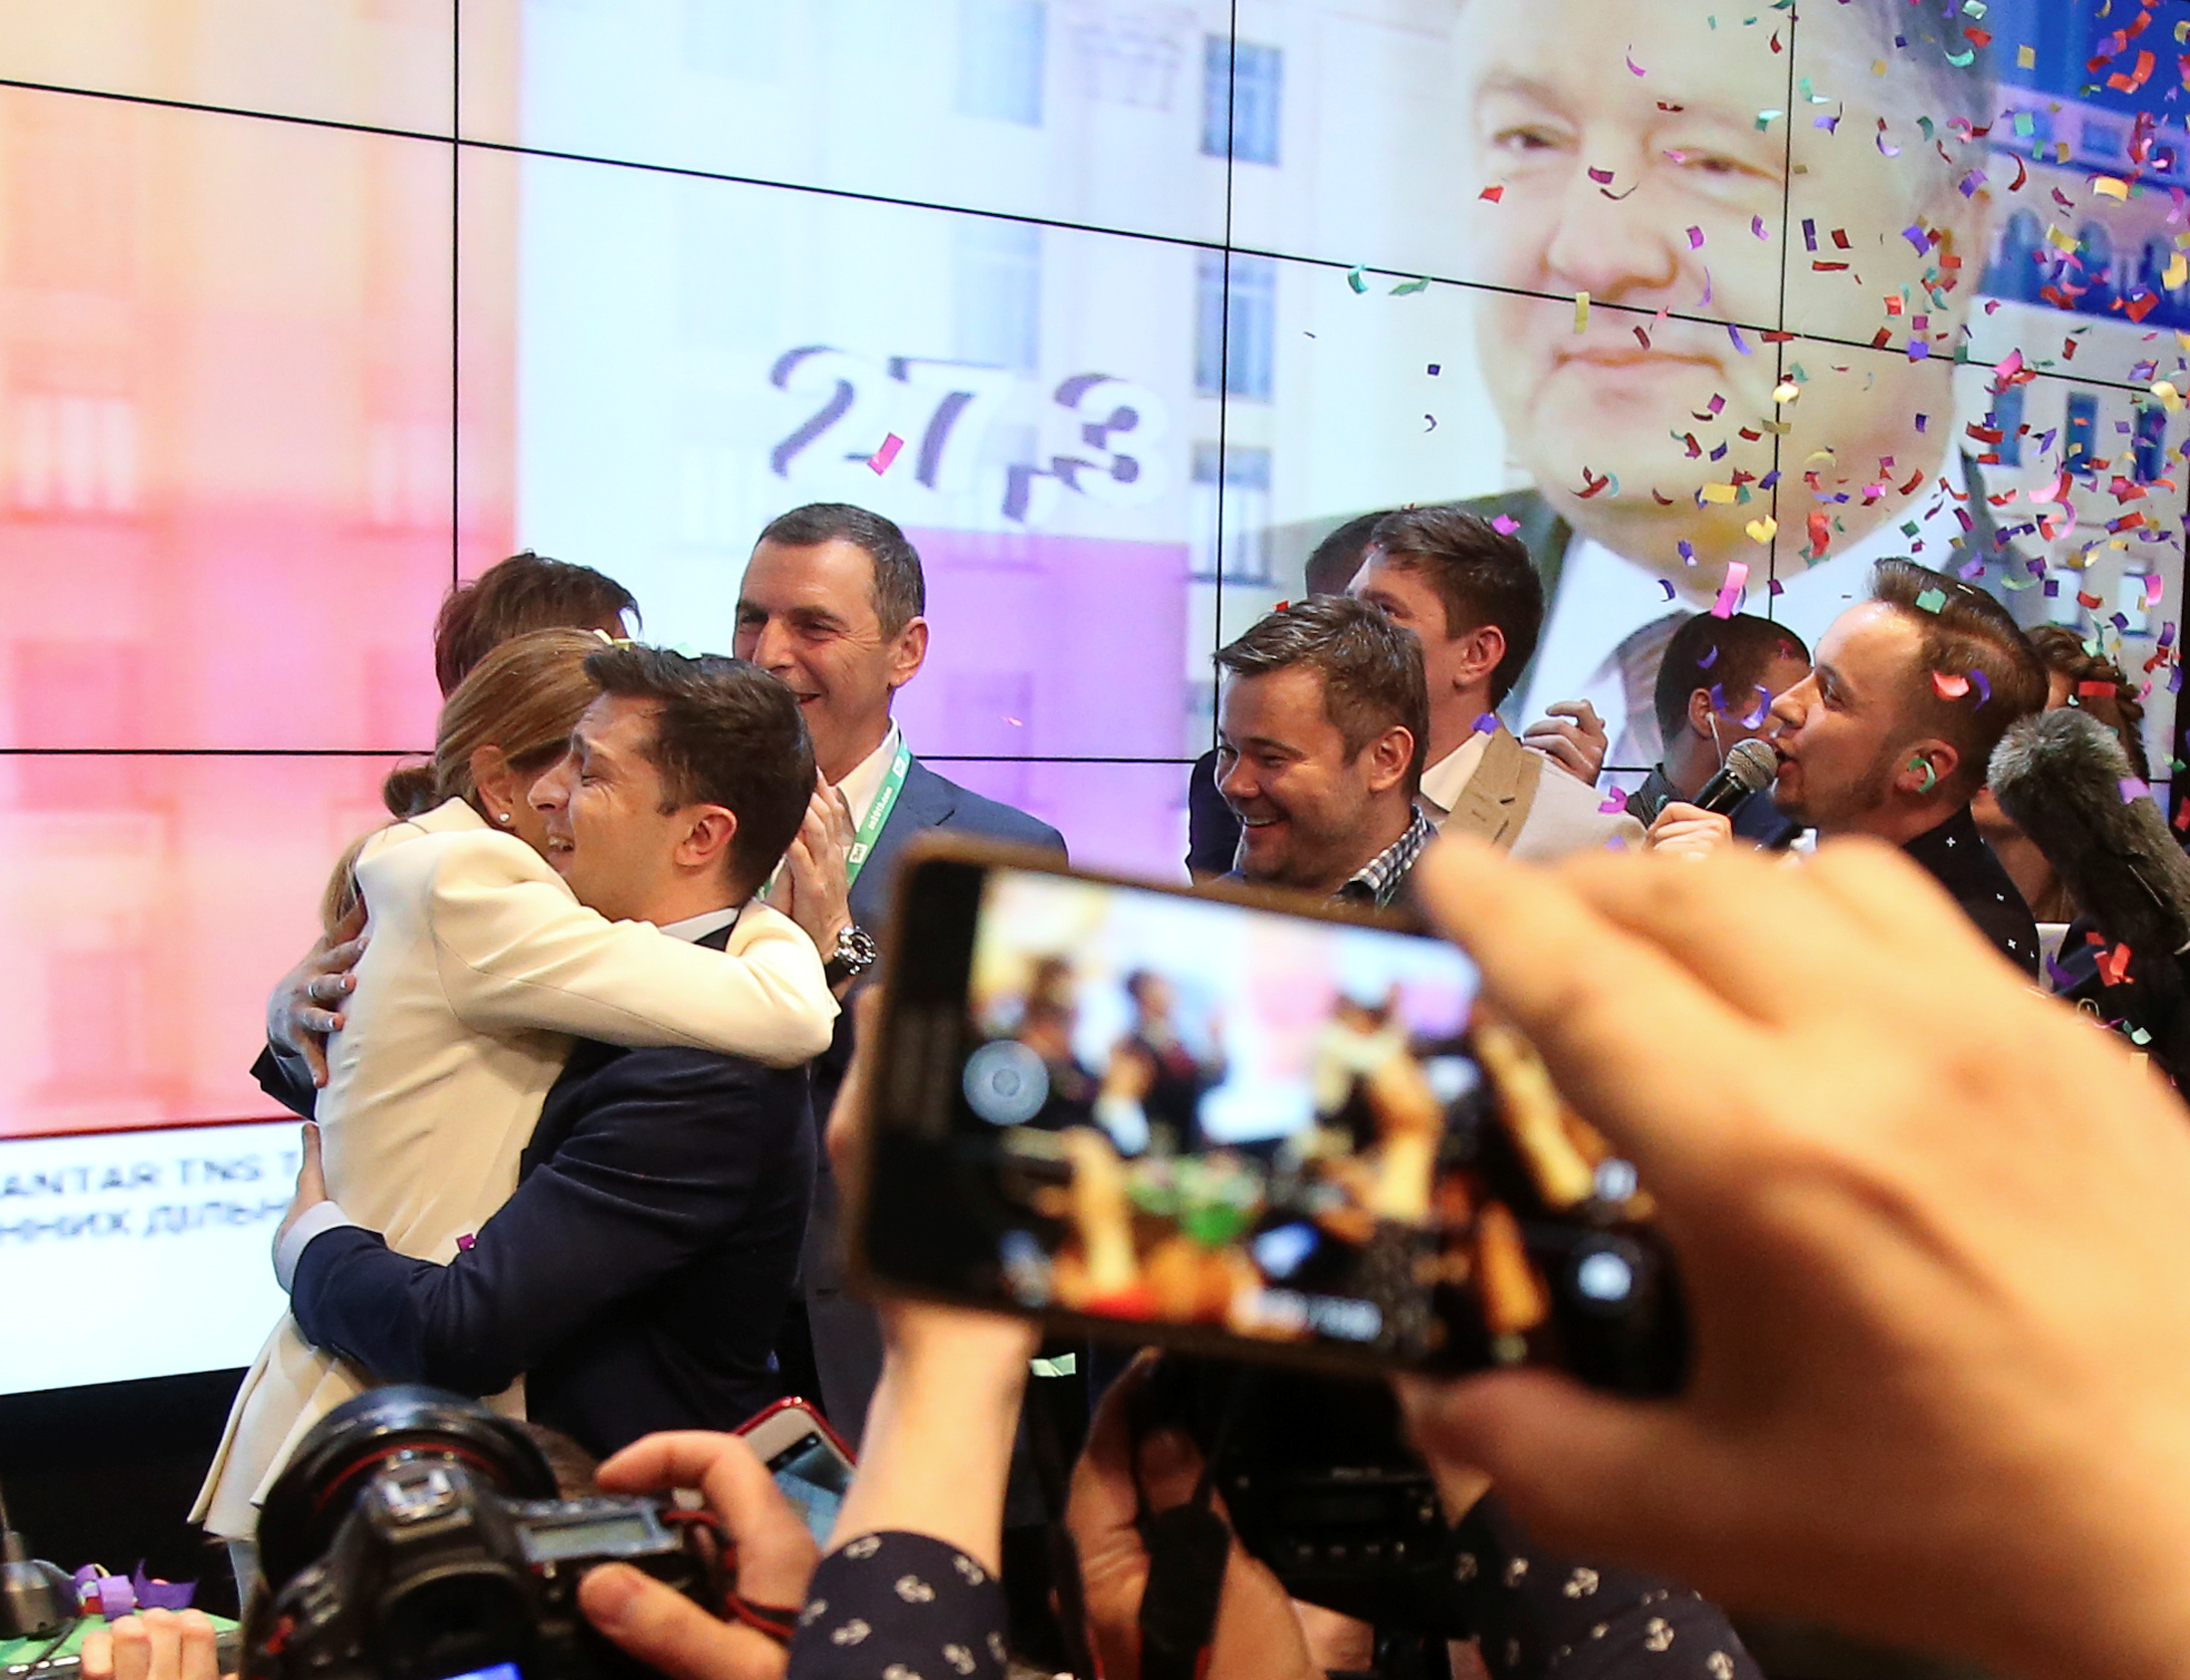 Volodymyr Zelensky embraces his wife